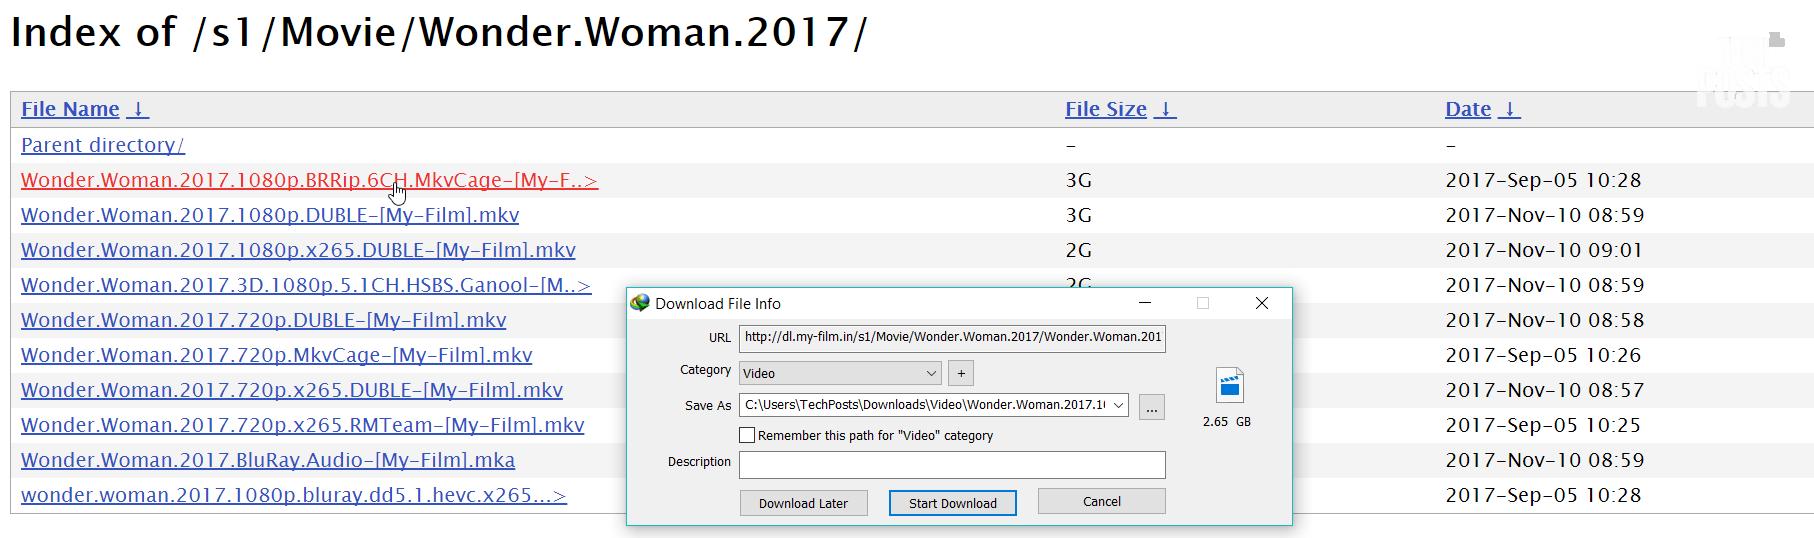 Index of _s1_Movie_Wonder.Woman.2017 Downloading